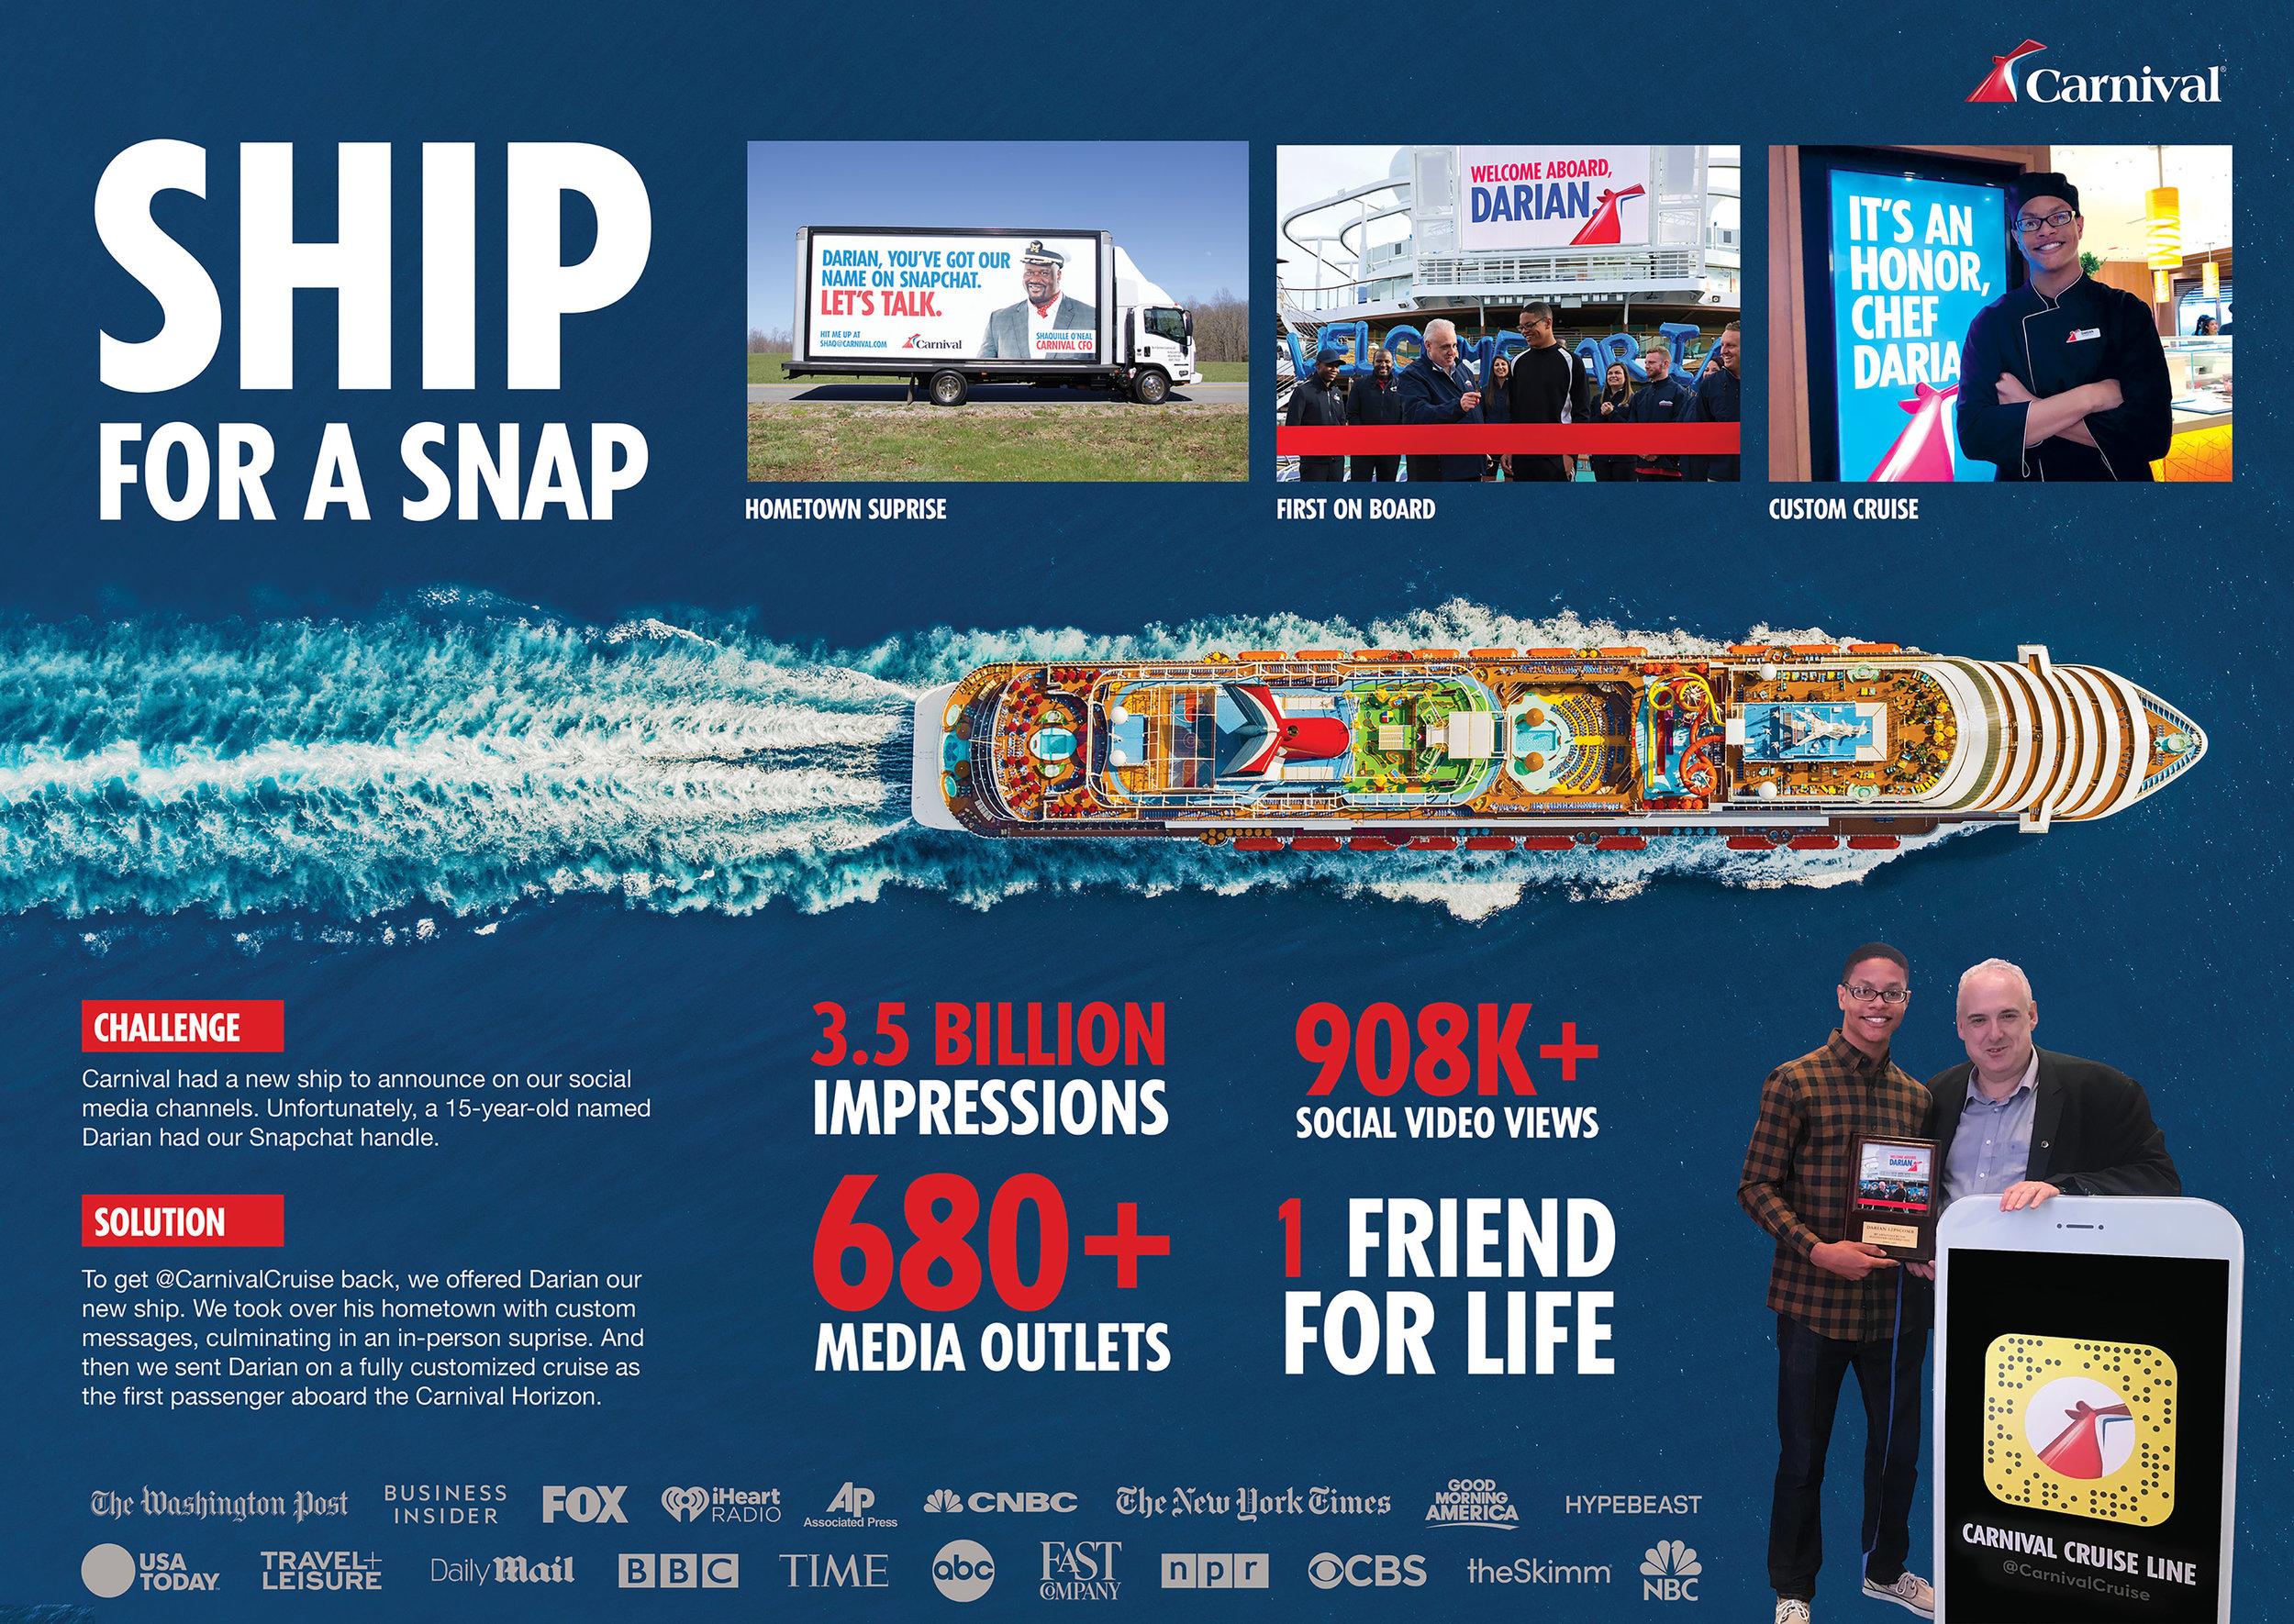 SHIPFORASNAP.jpg